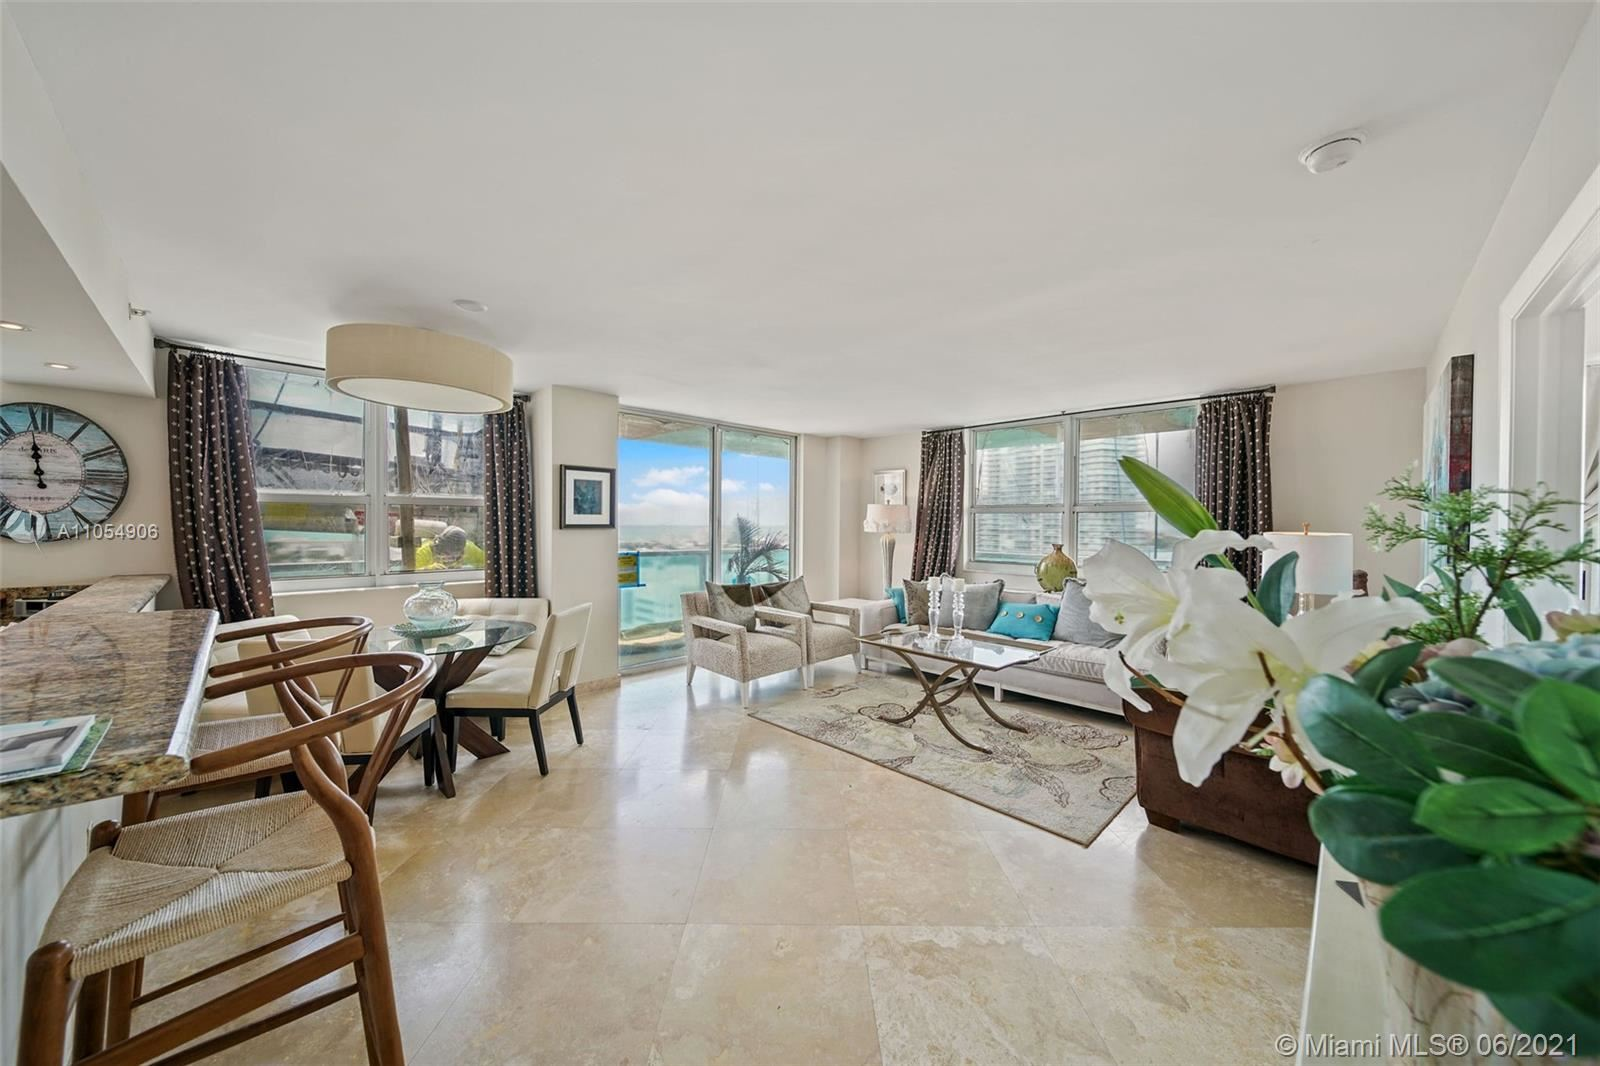 650 West Ave #1902, Miami Beach, FL 33139 - #: A11054906